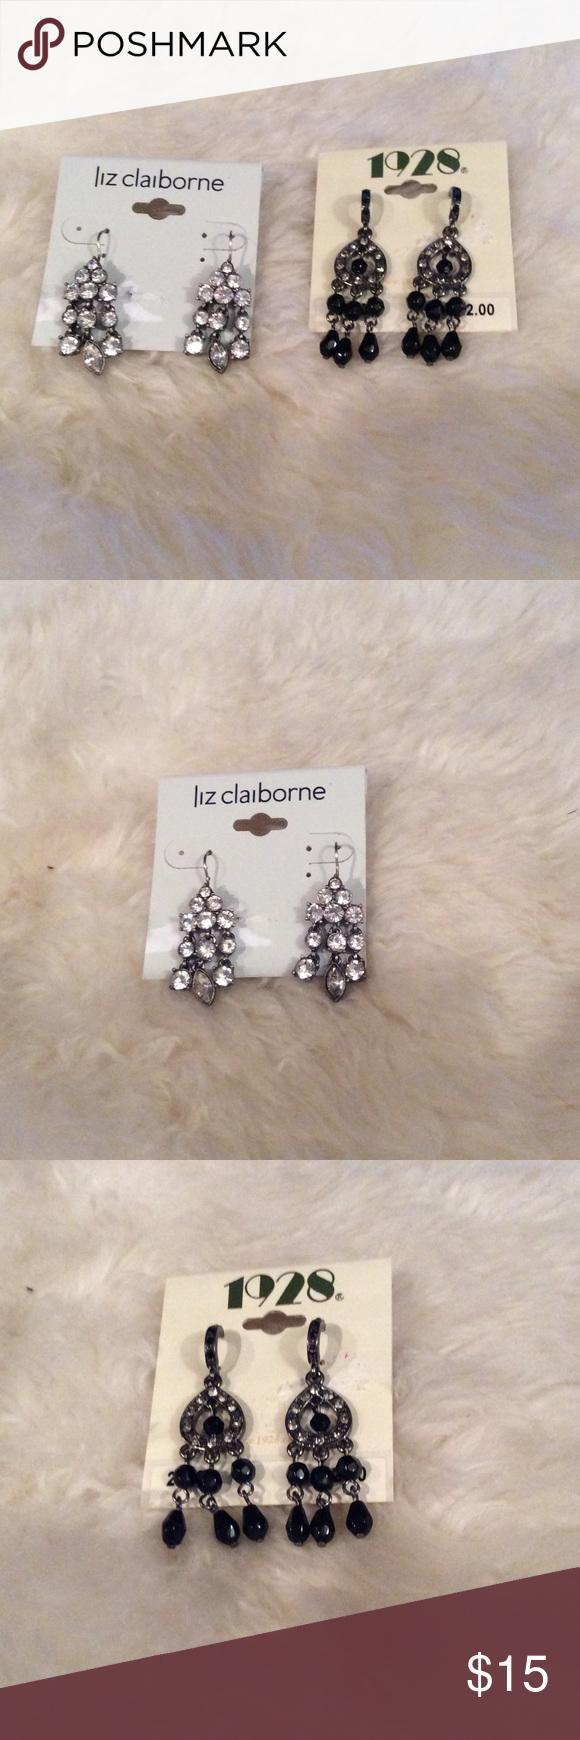 2 pairs of chandelier earrings Liz Claiborne silver rhinestone ...